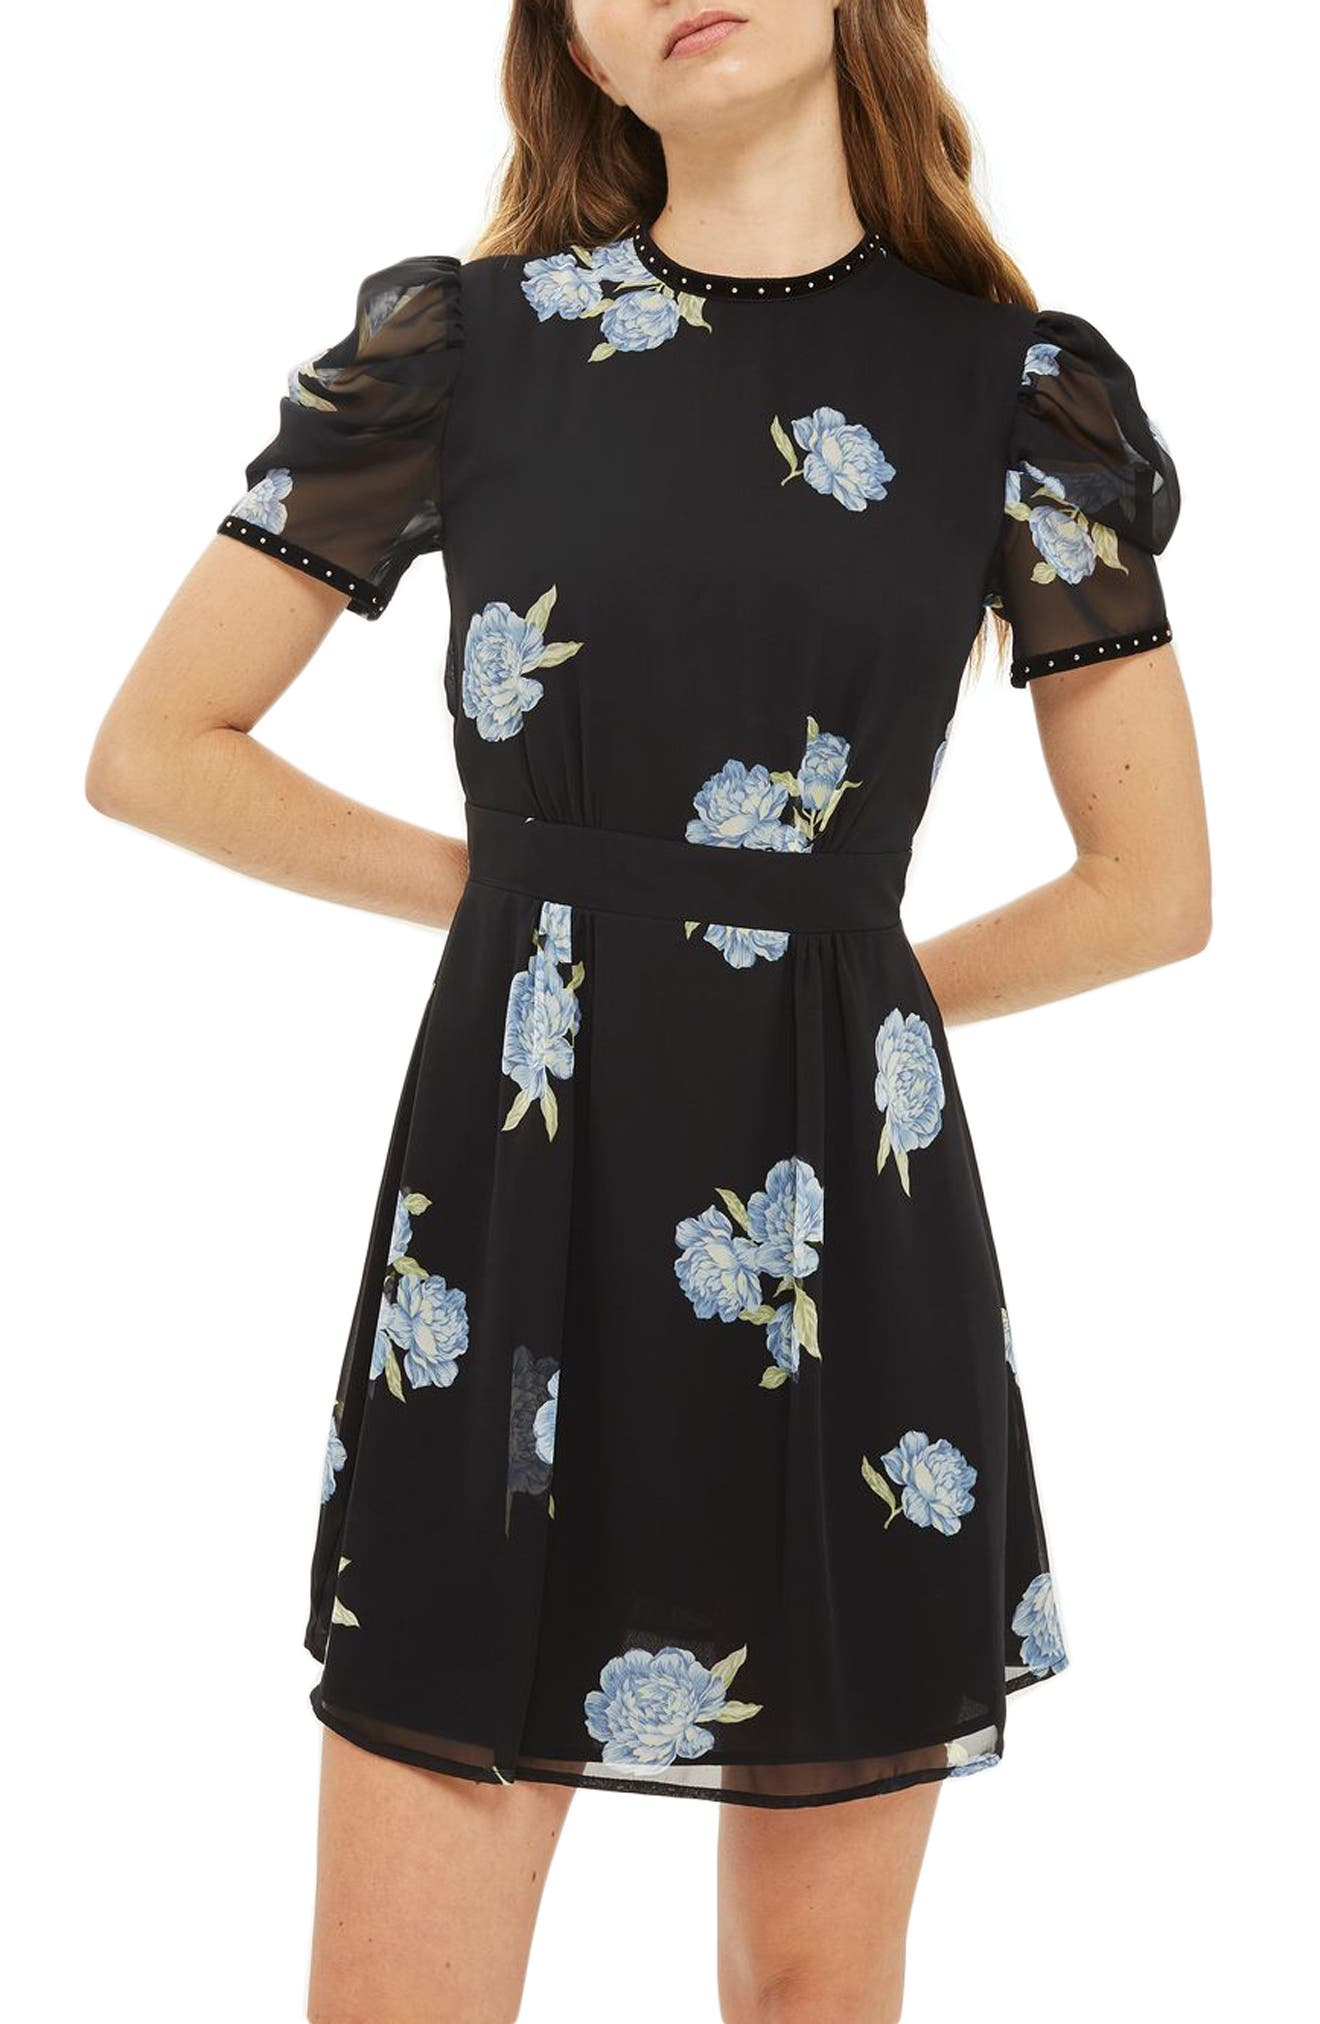 Alternate Image 1 Selected - Topshop Bloom Studded Puff Sleeve Skater Dress